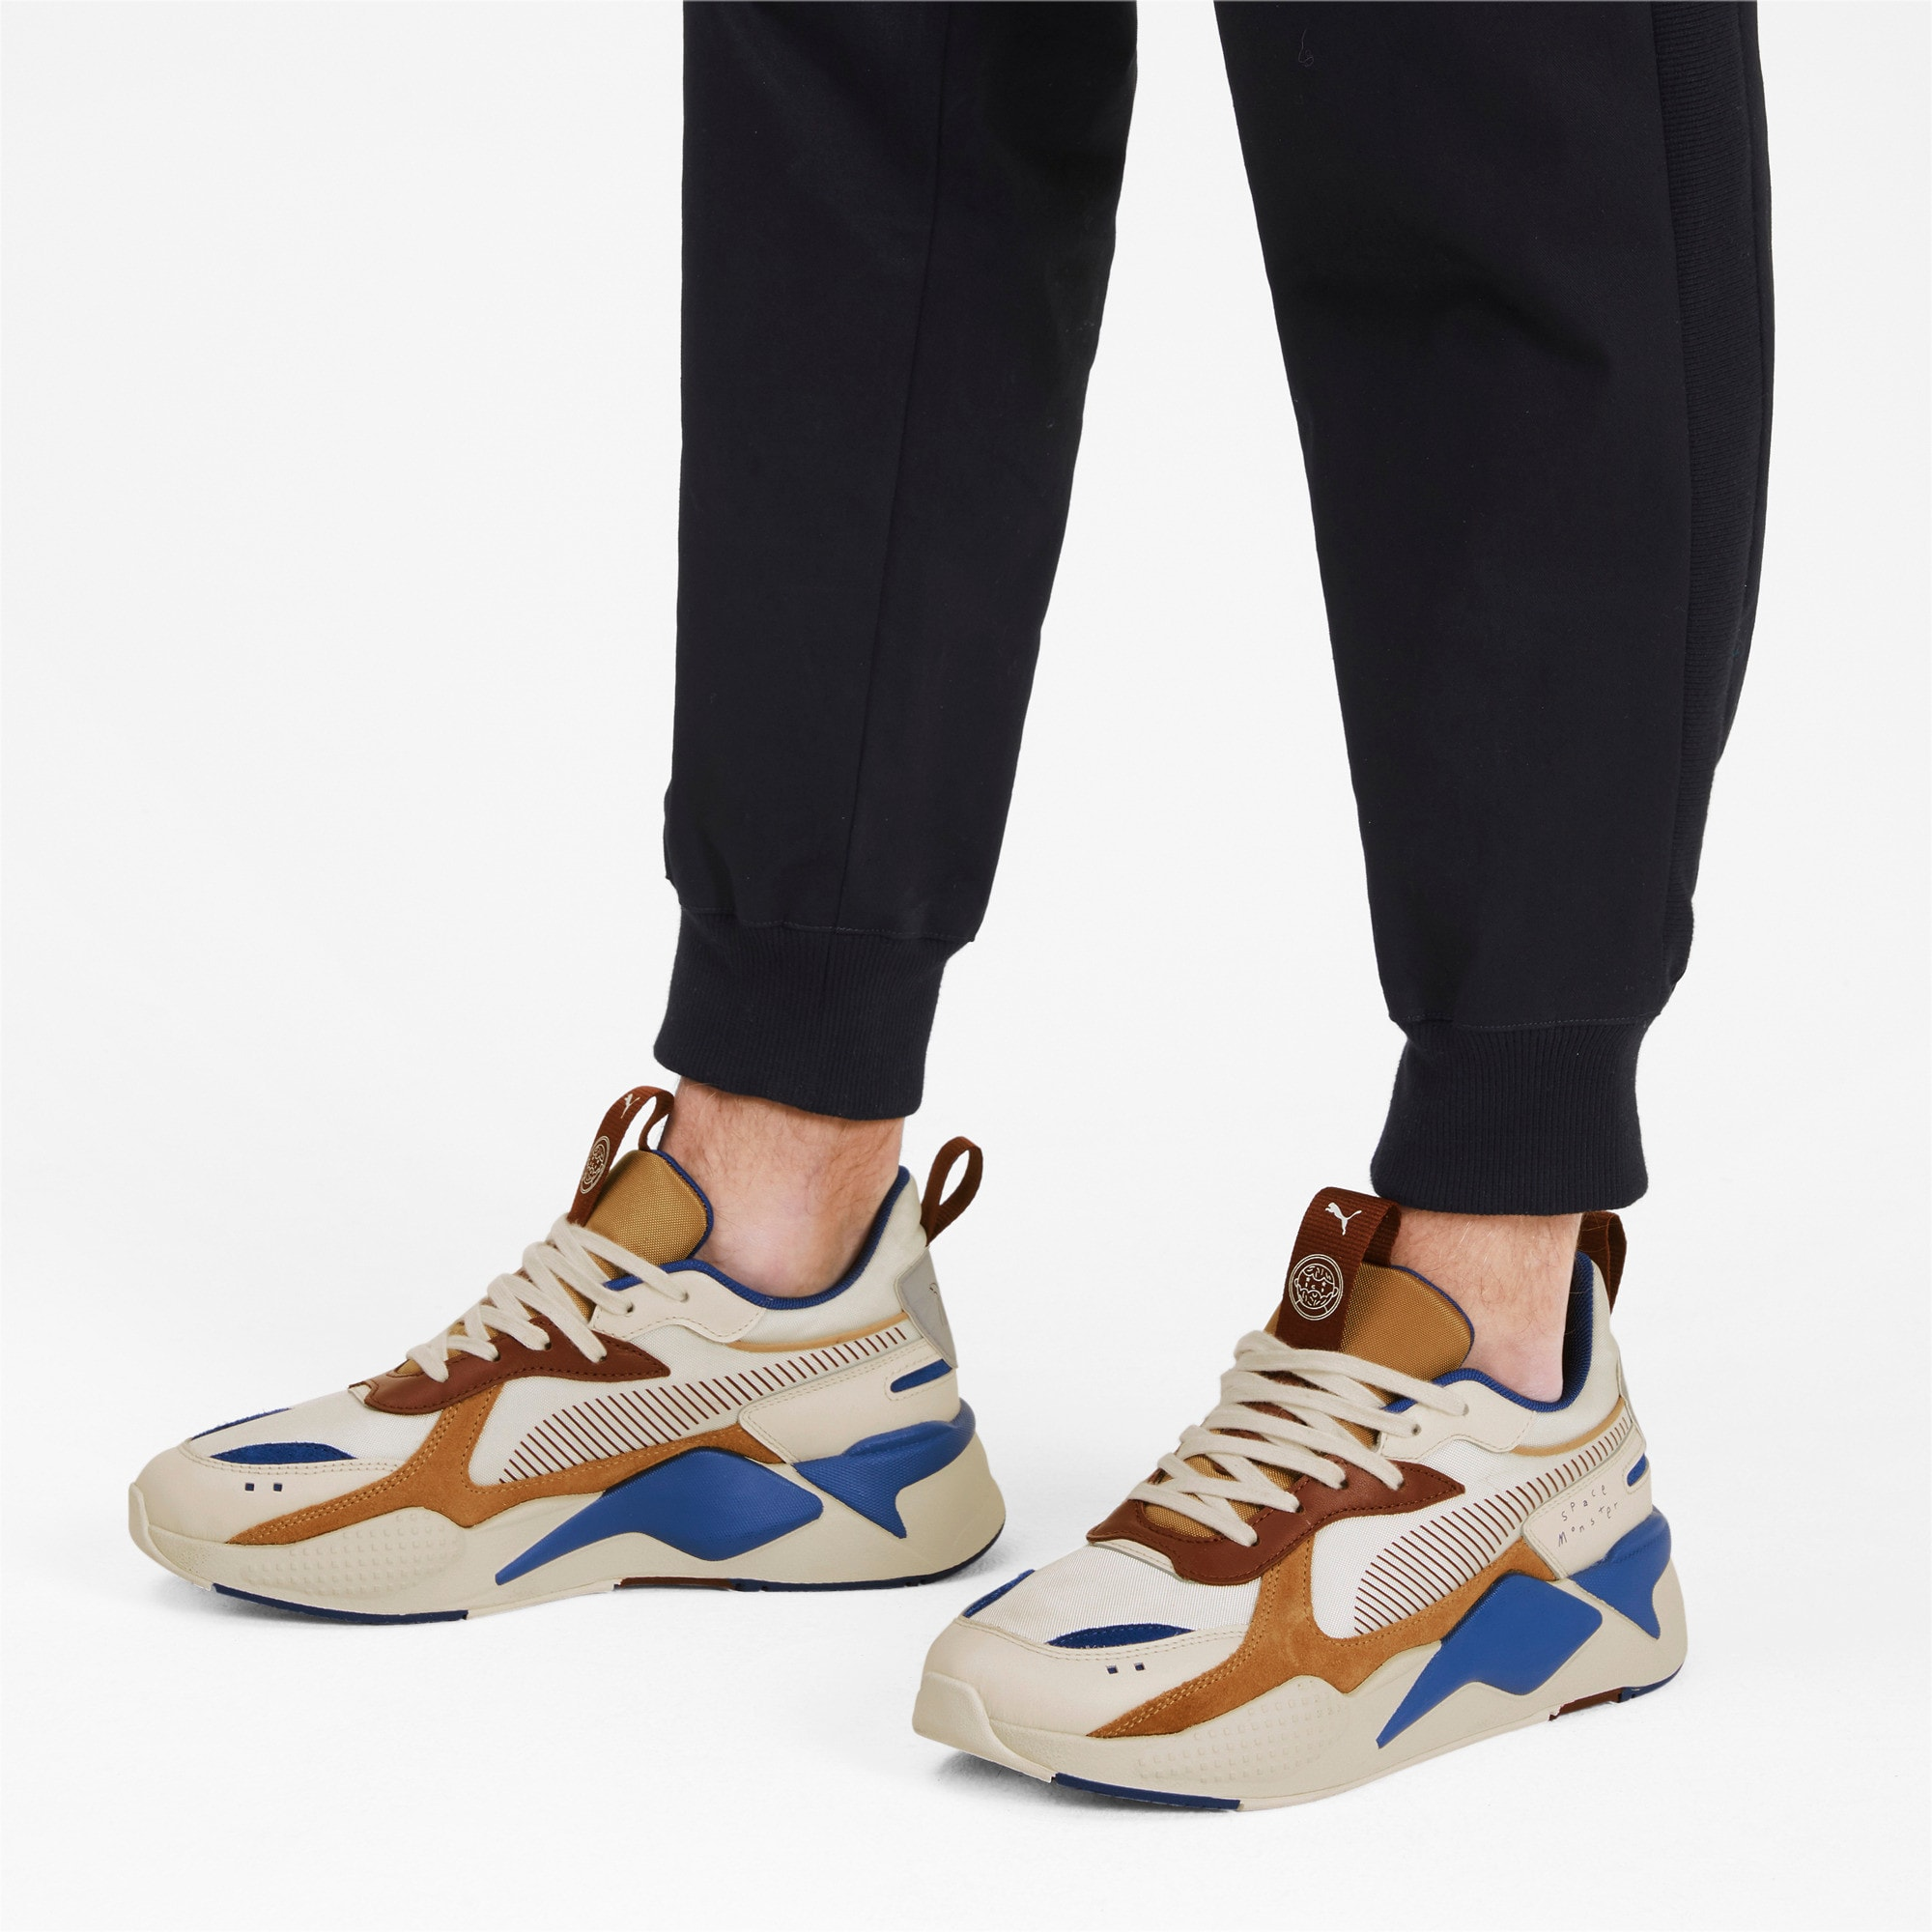 Miniatura 3 de Zapatos deportivos PUMA x TYAKASHA RS-X, Whisper White-Fired Brick, mediano